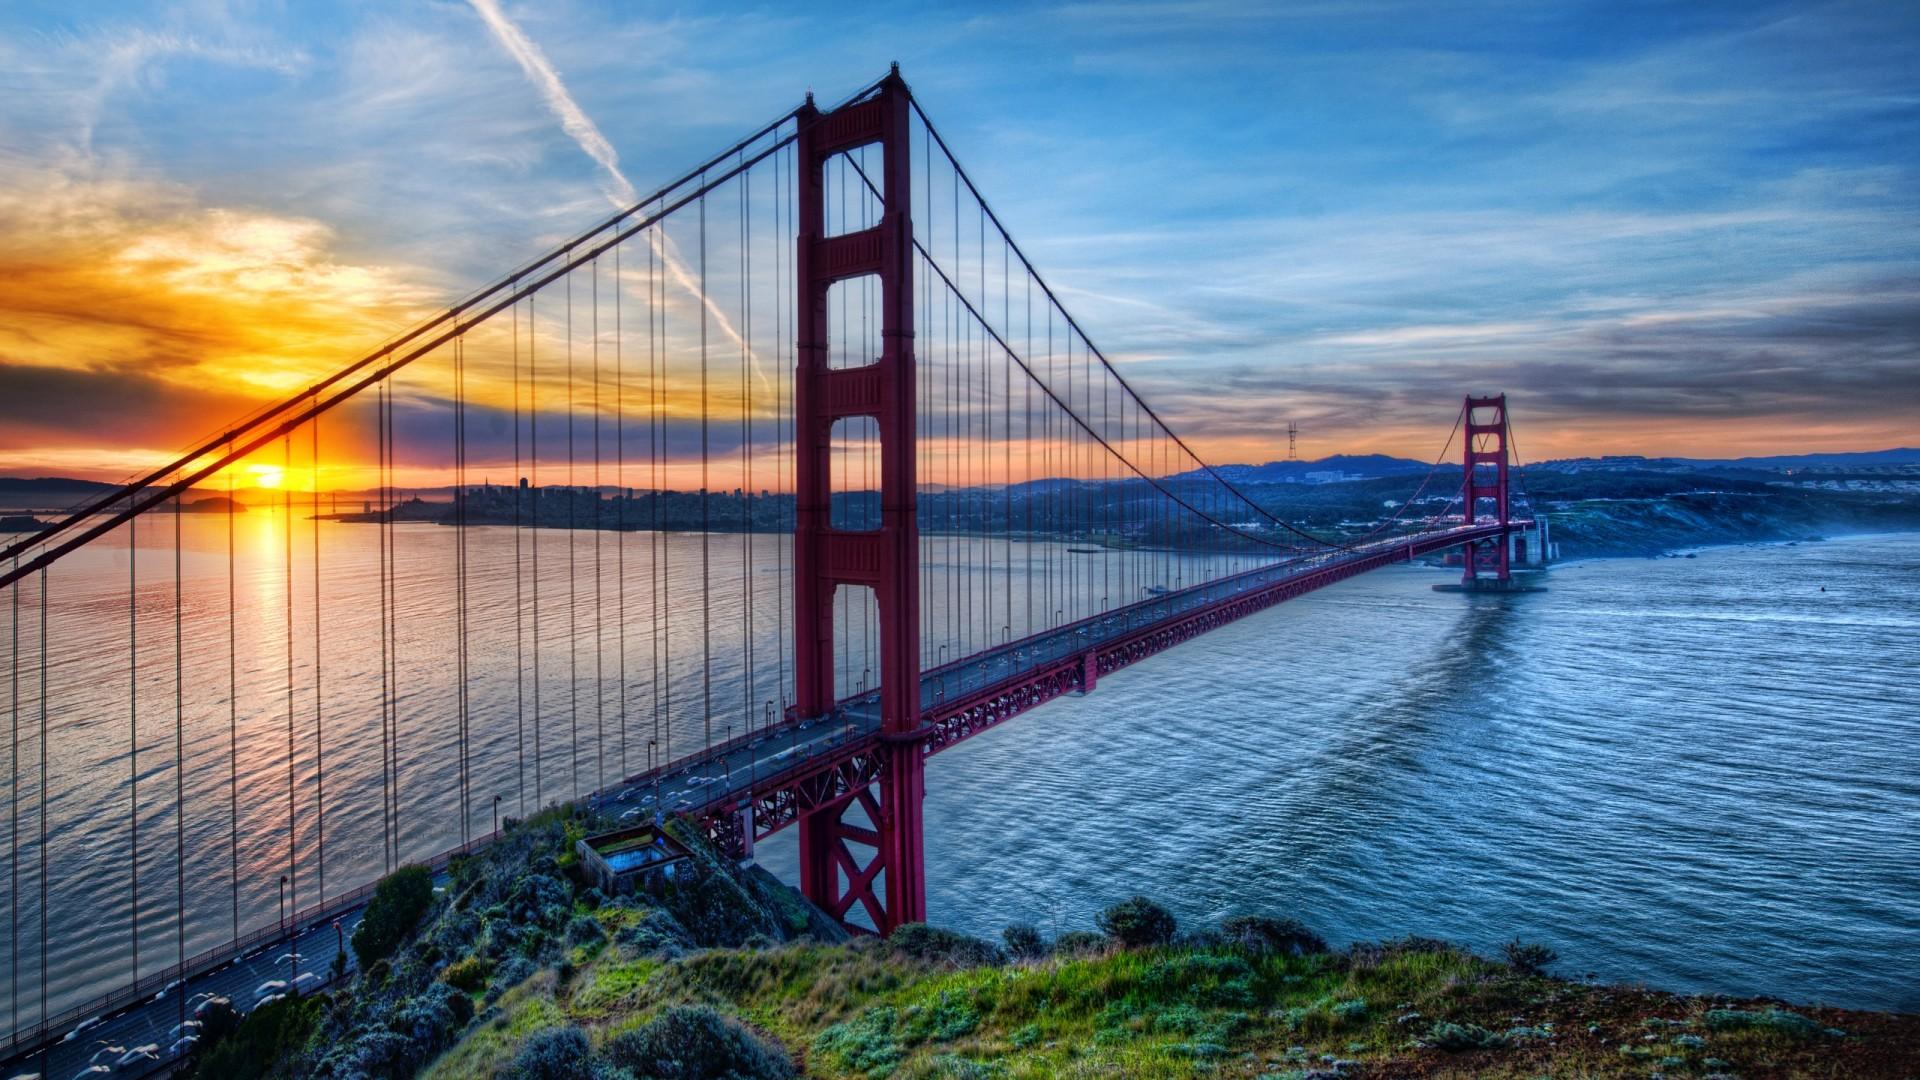 the-bridge-of-san-francisco-secret-world